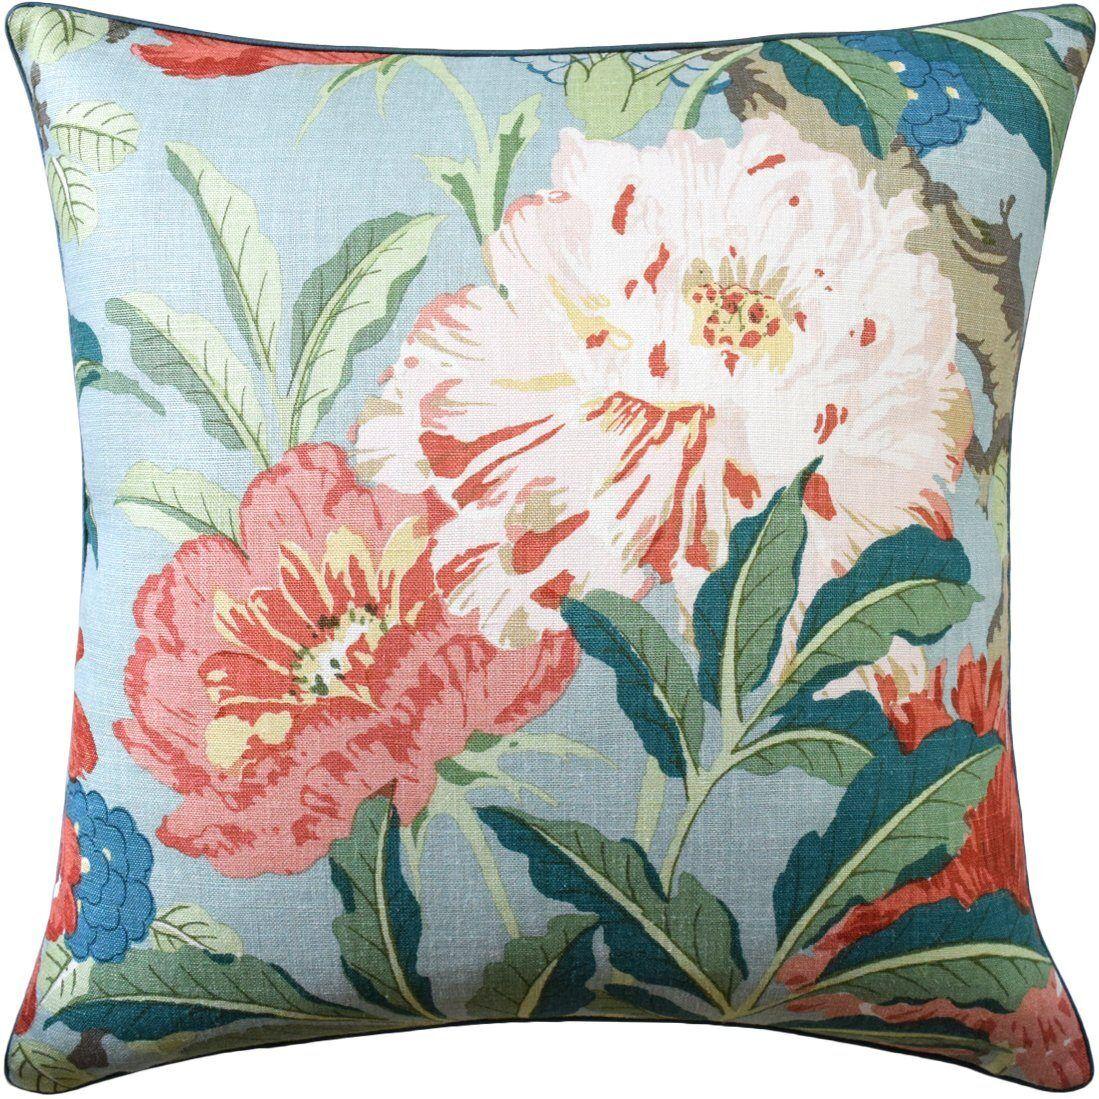 Ryan Studio Enchanted Garden Aqua Pillow by Ryan Studio